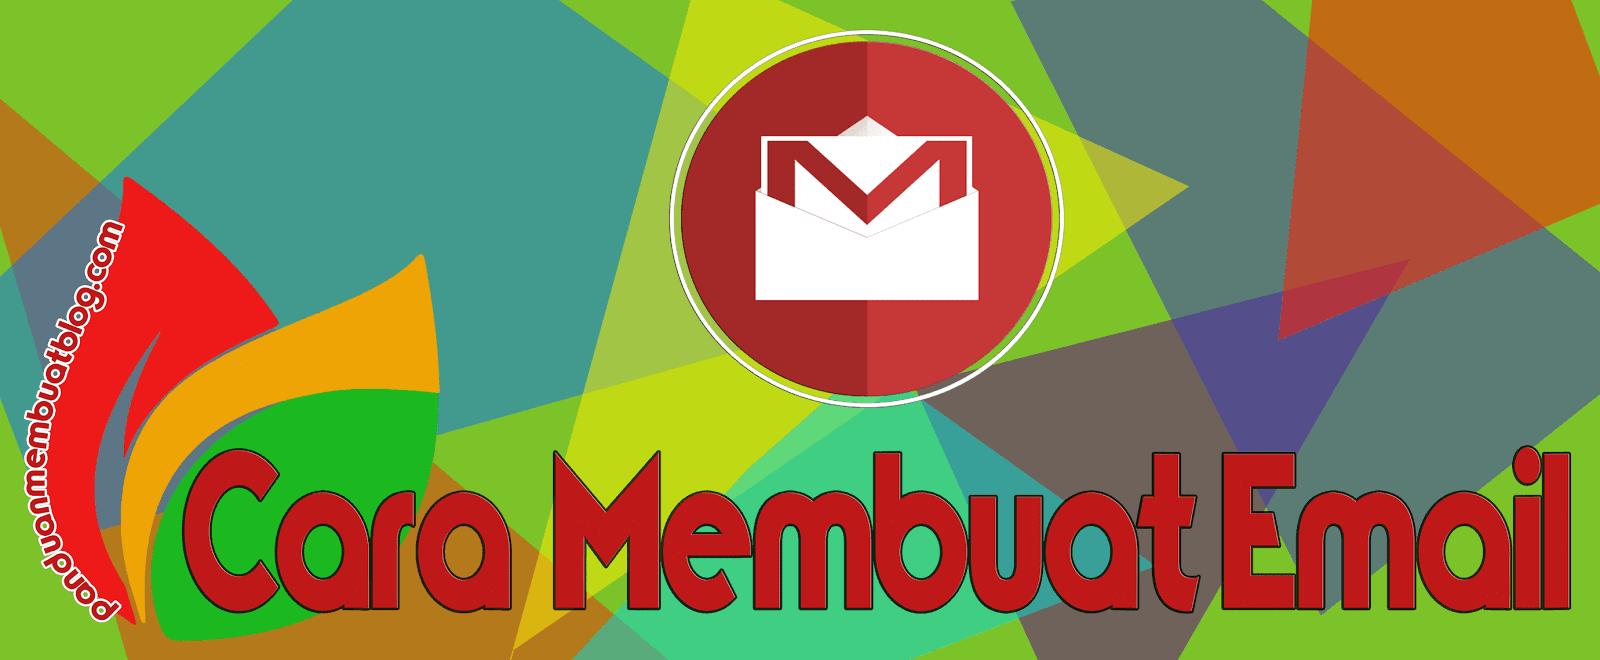 Bagaimana Cara Membuat Email Untuk Pemula Dengan Mudah